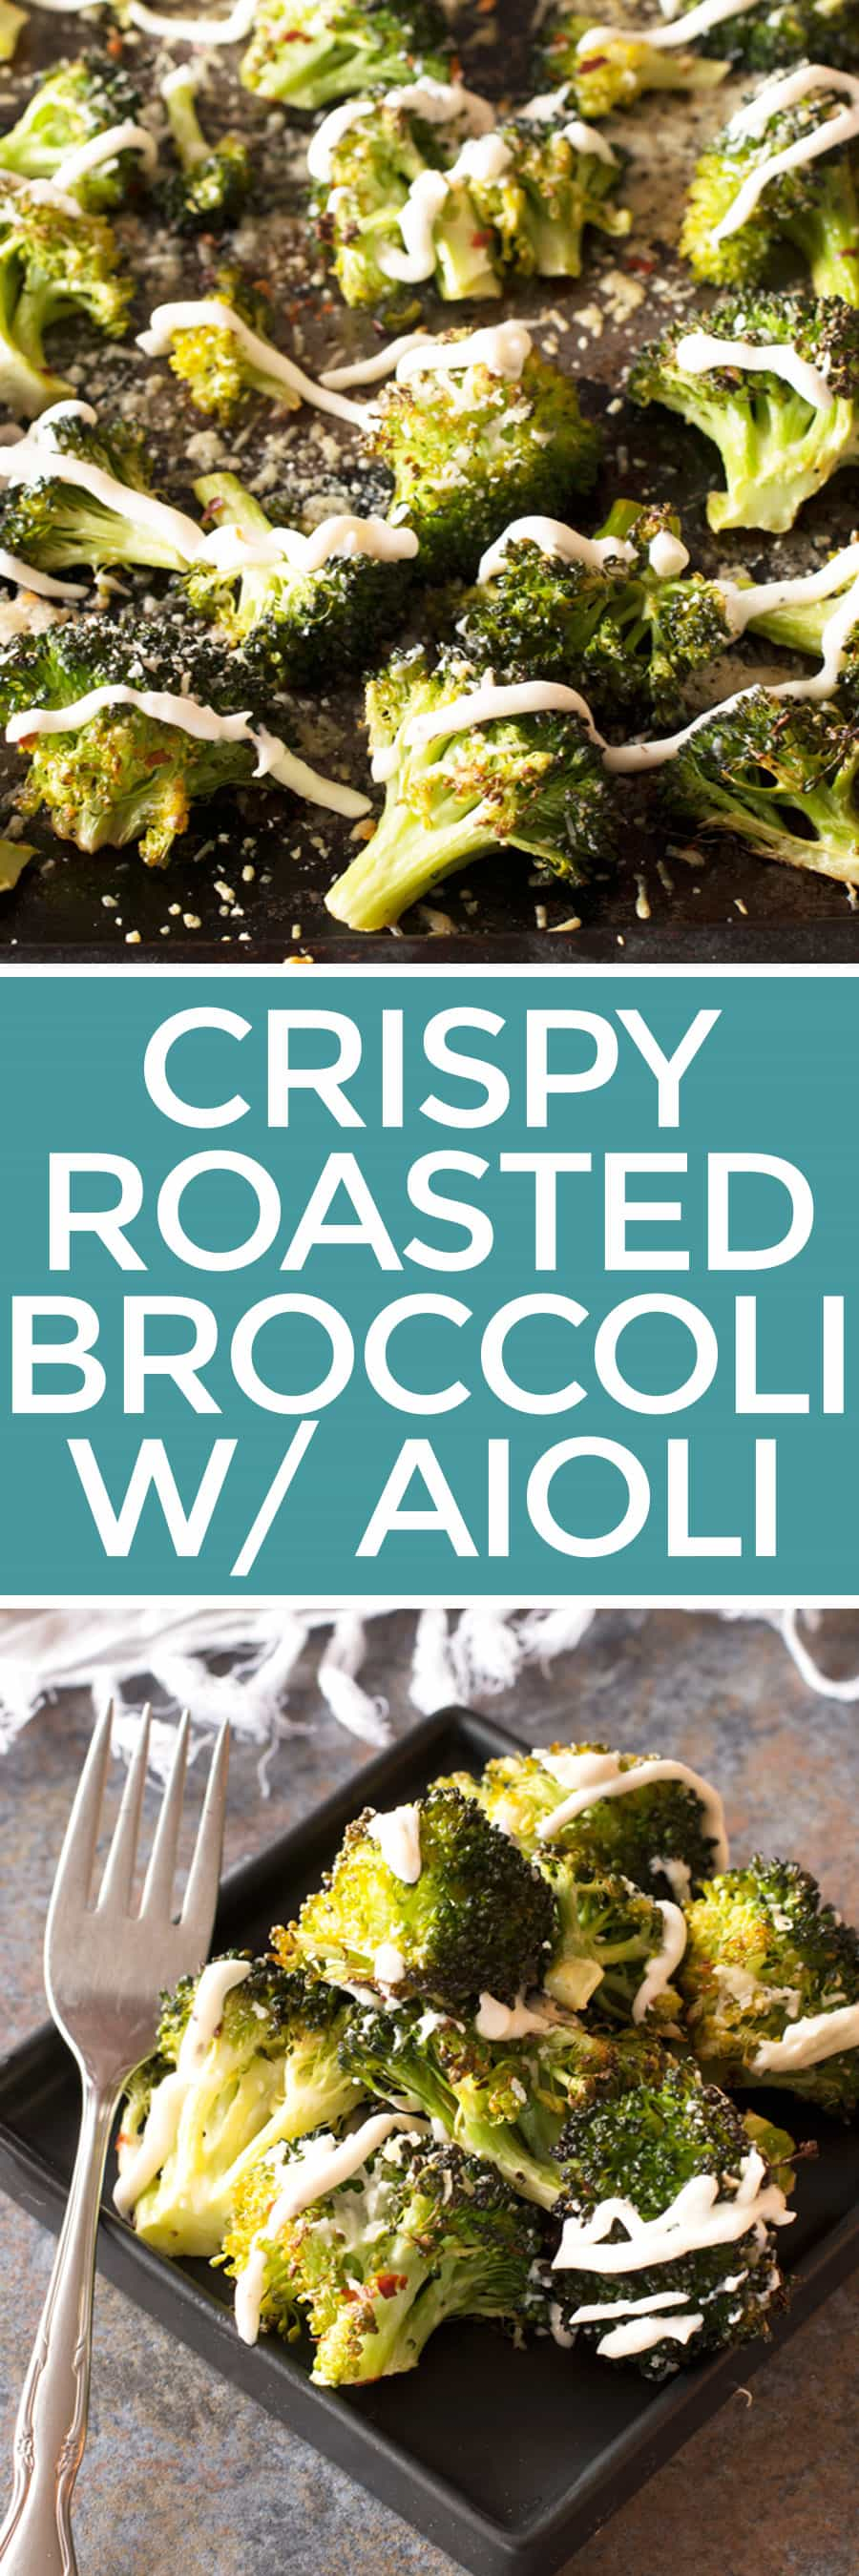 Crispy Roasted Broccoli with Roasted Garlic Aioli | cakenknife.com